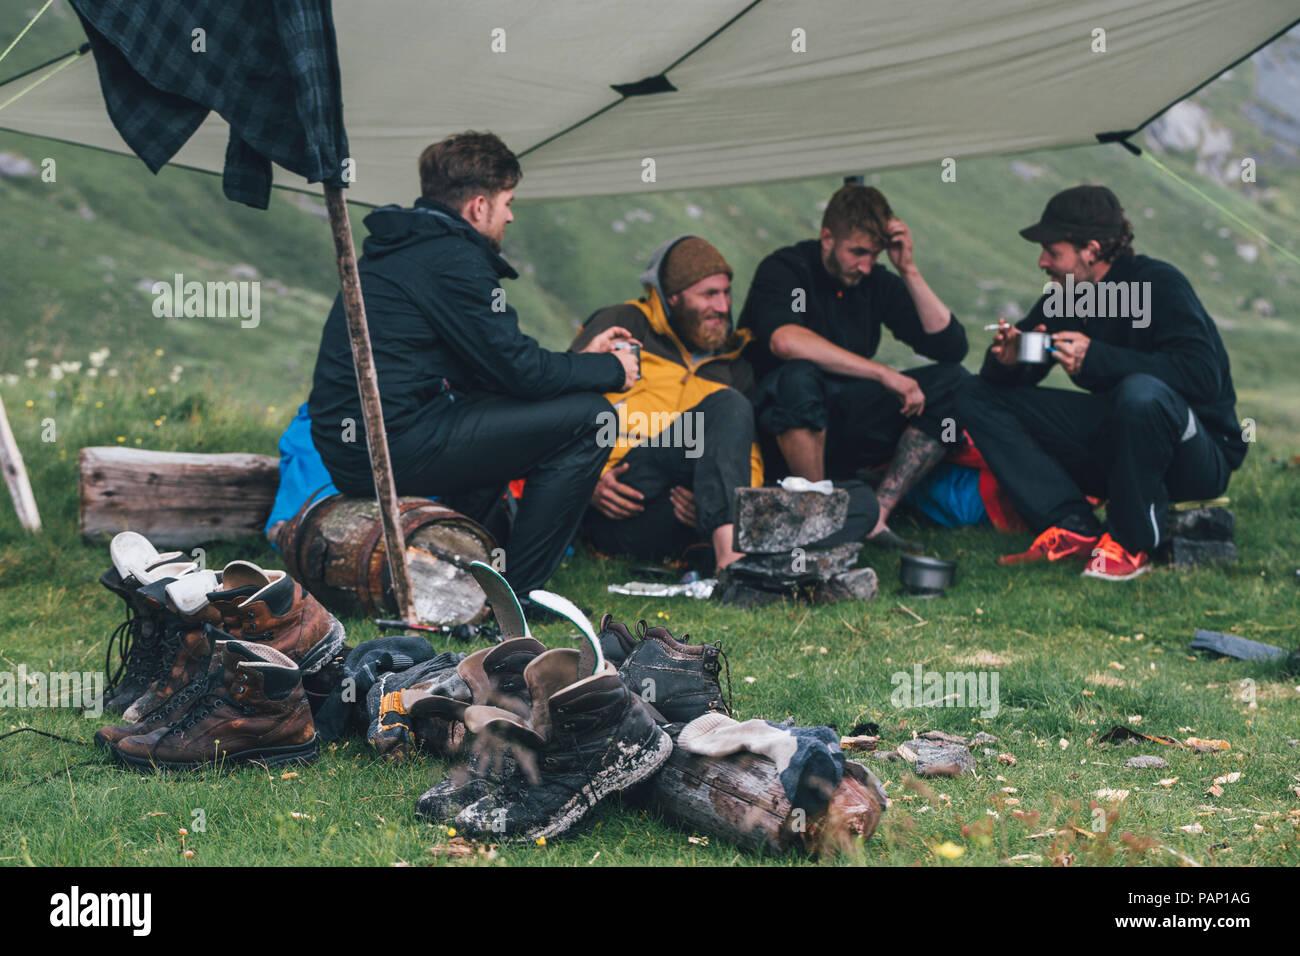 Norway, Lofoten, Moskenesoy, Young men camping at Horseid Beach - Stock Image